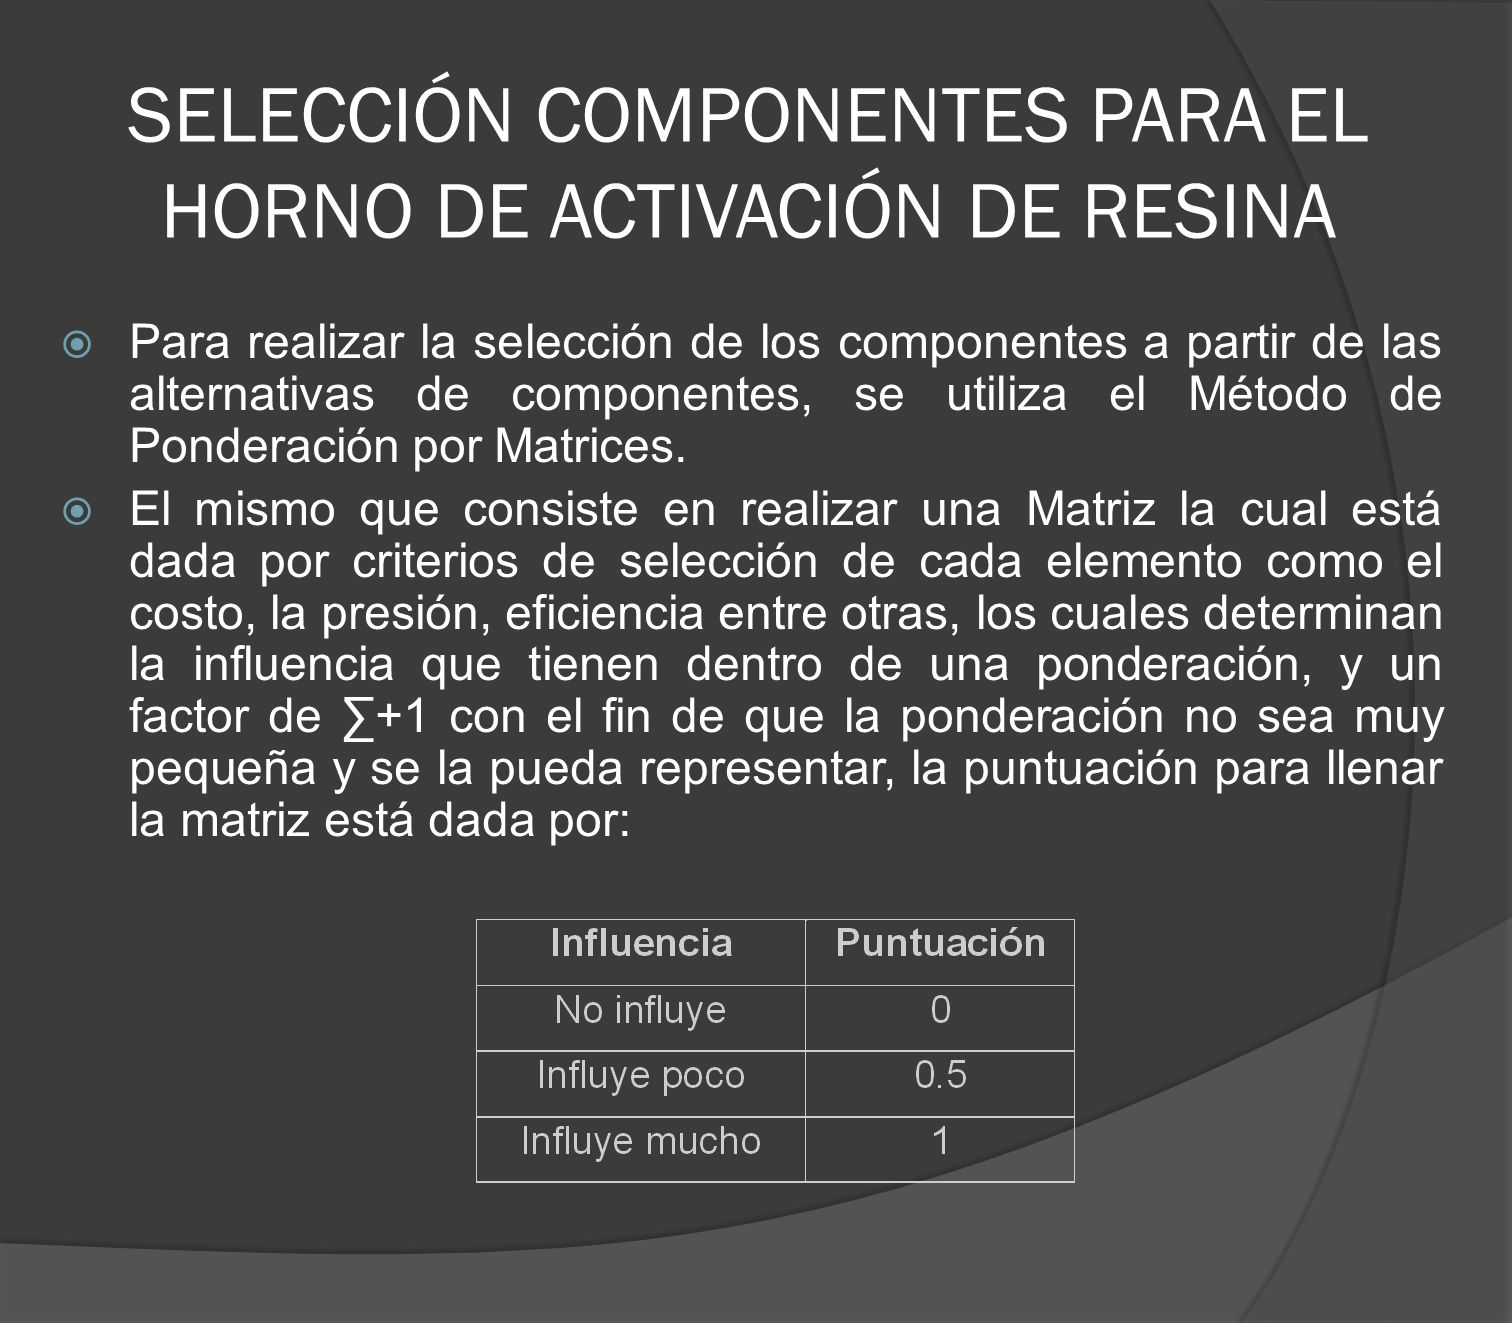 SELECCIÓN COMPONENTES PARA EL HORNO DE ACTIVACIÓN DE RESINA